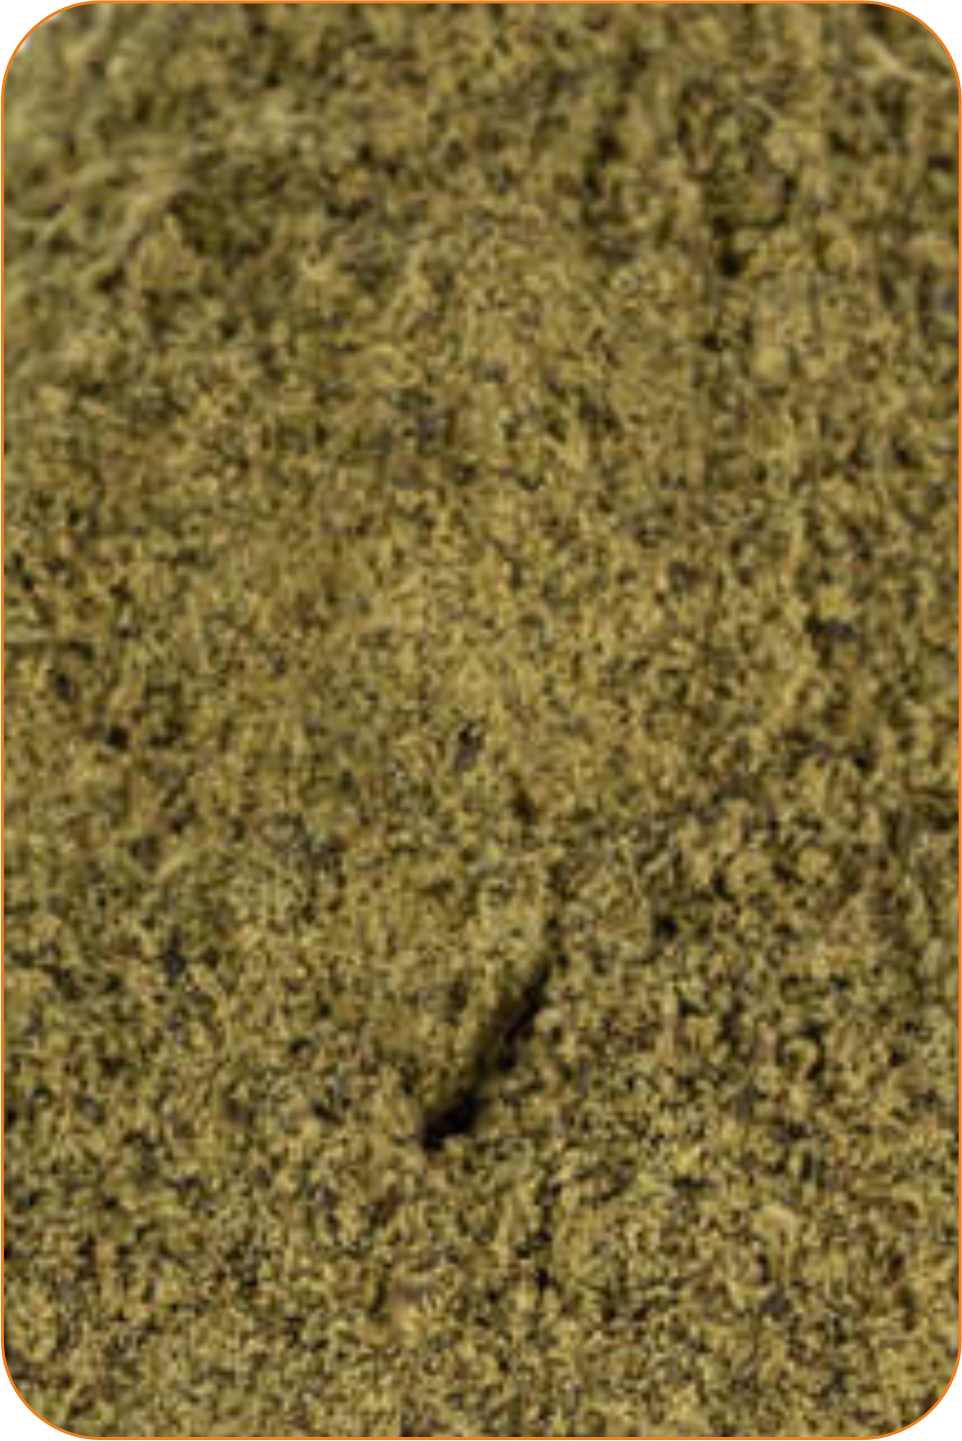 Konopné semínko 0,5 kg / MLETÉ